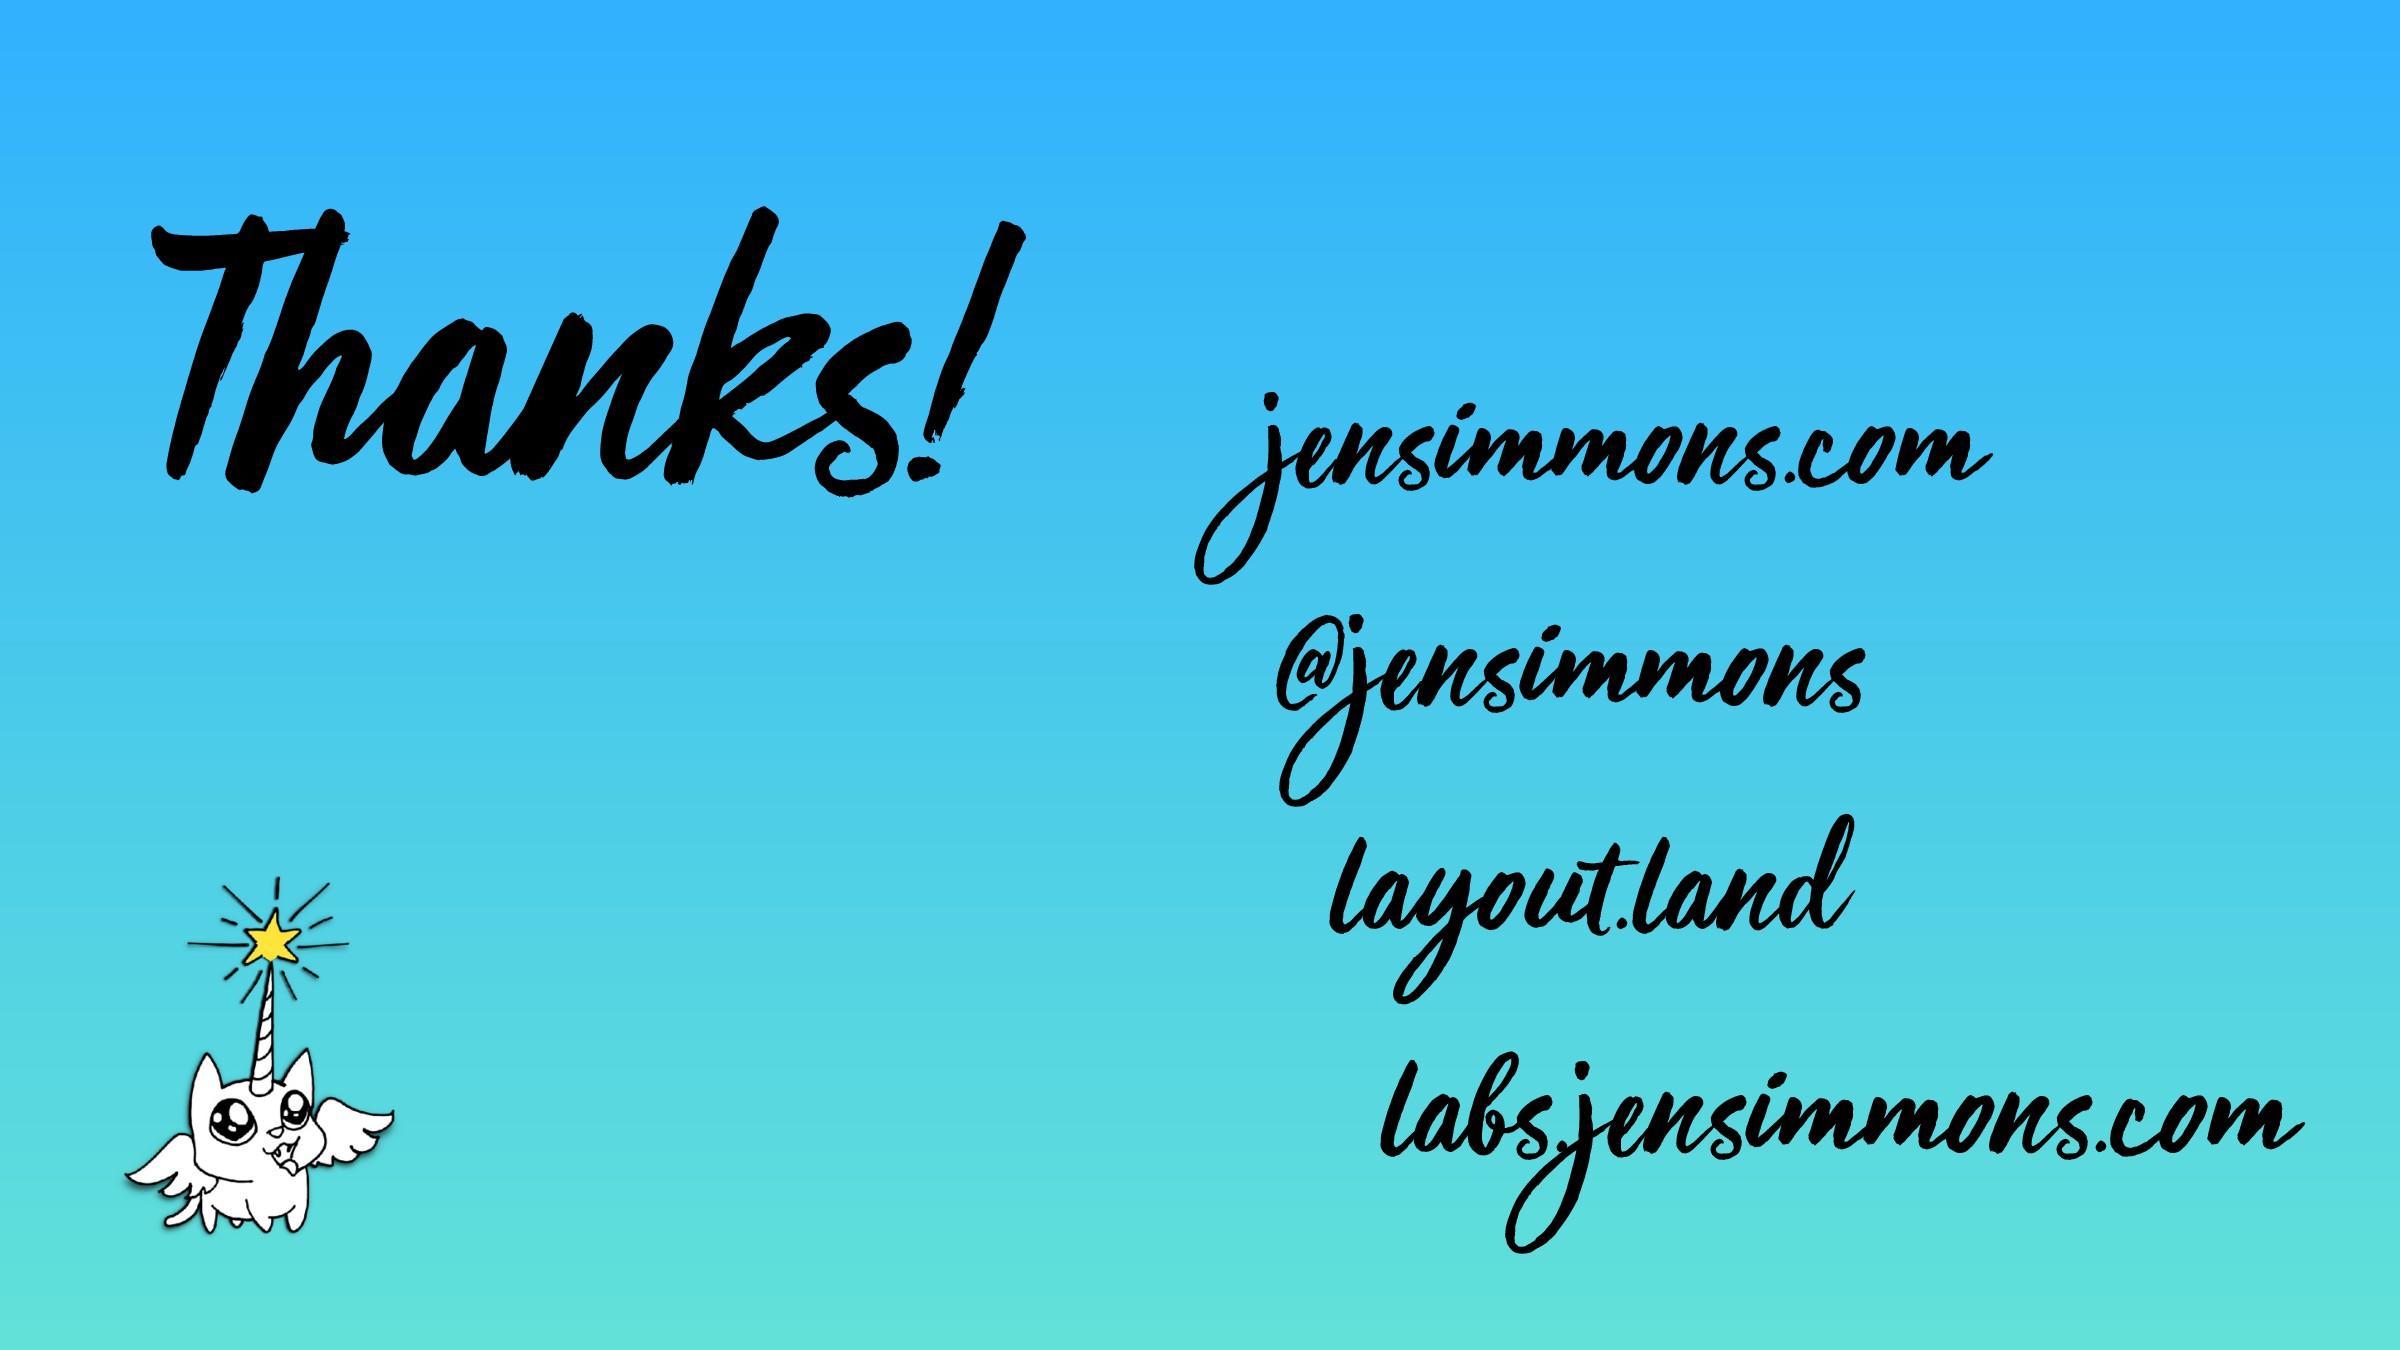 jensimmons.com @jensimmons layout.land labs.jen...